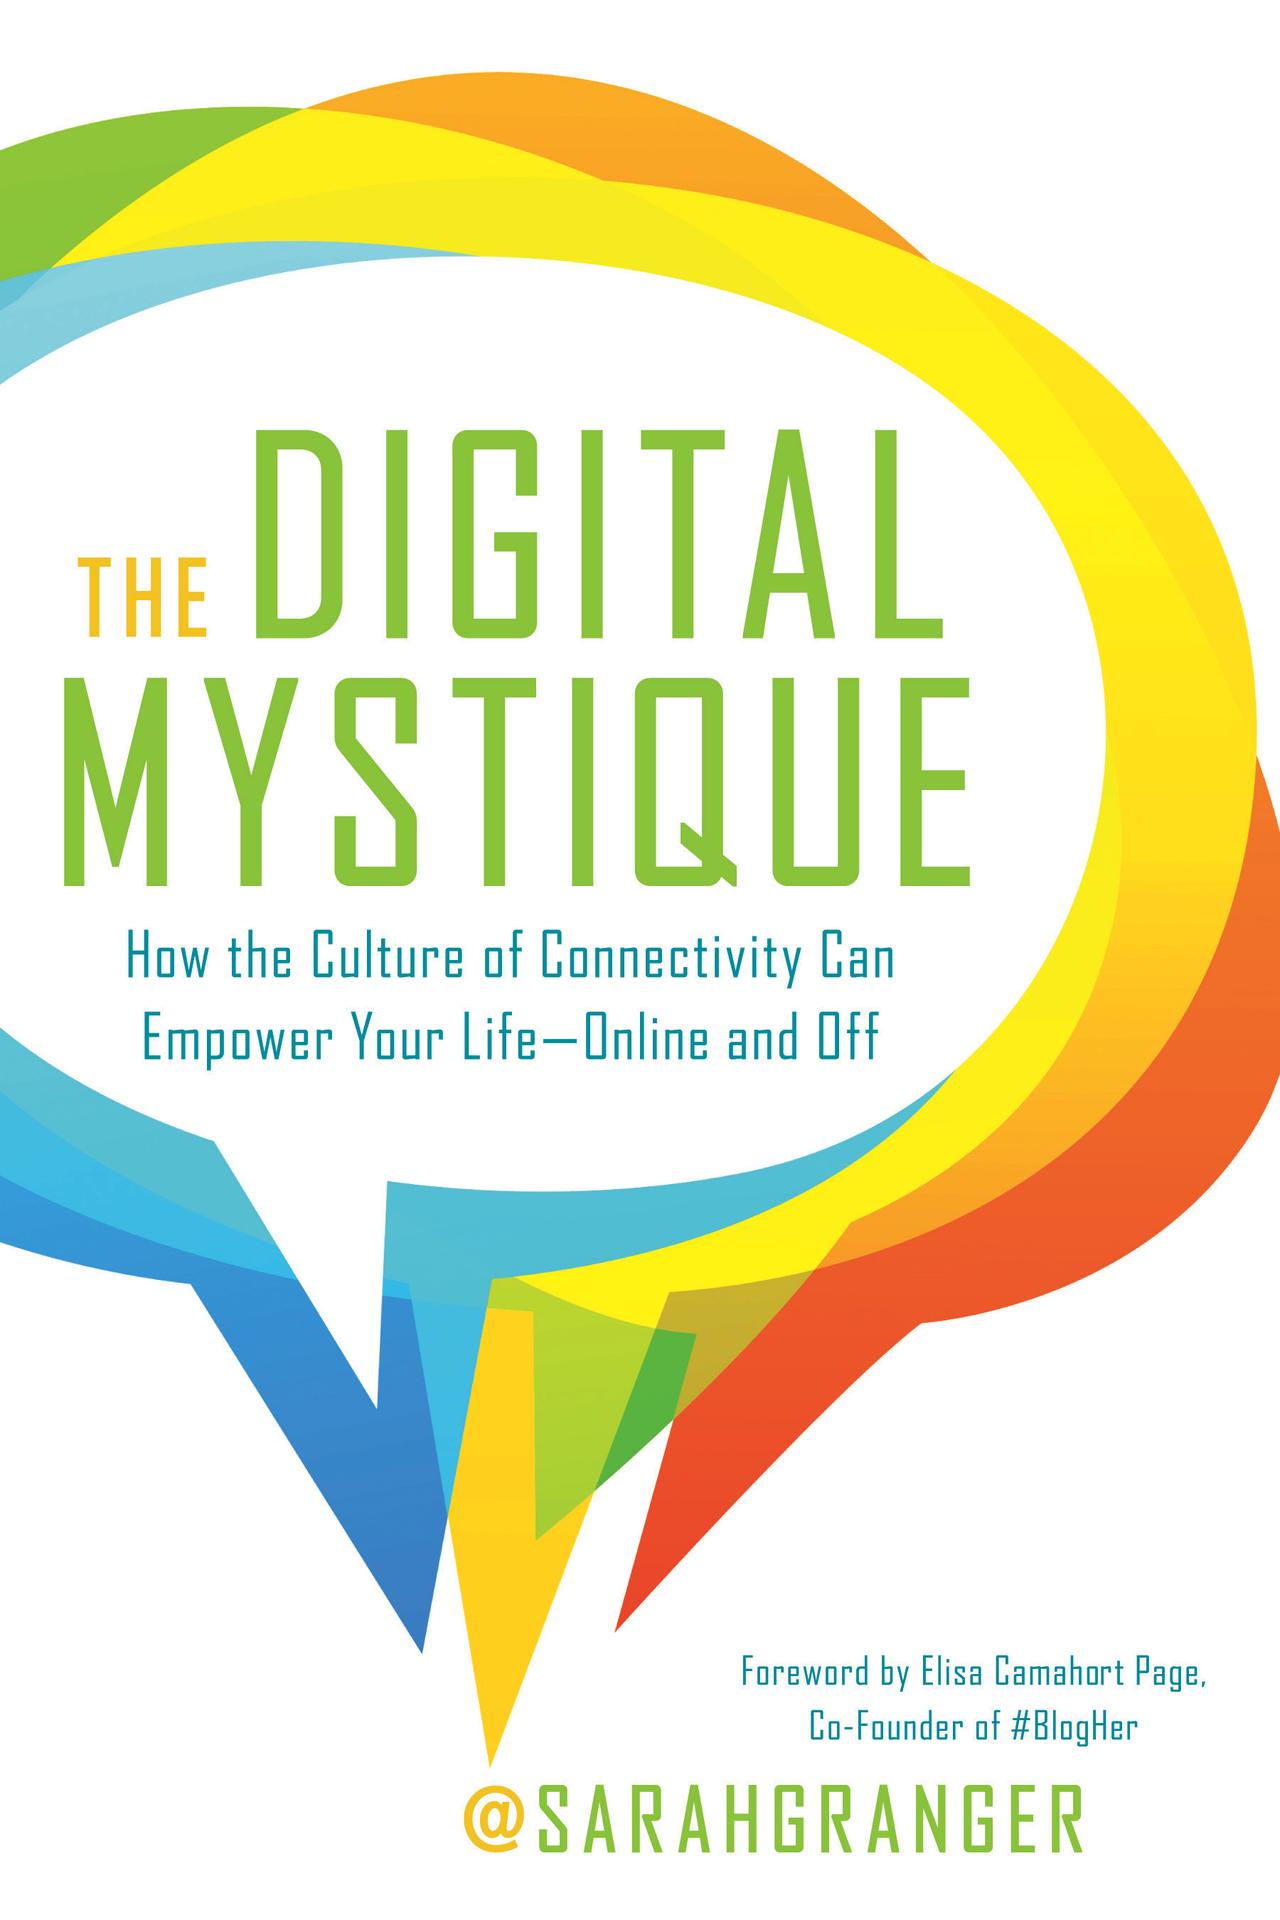 Digital mystique cover